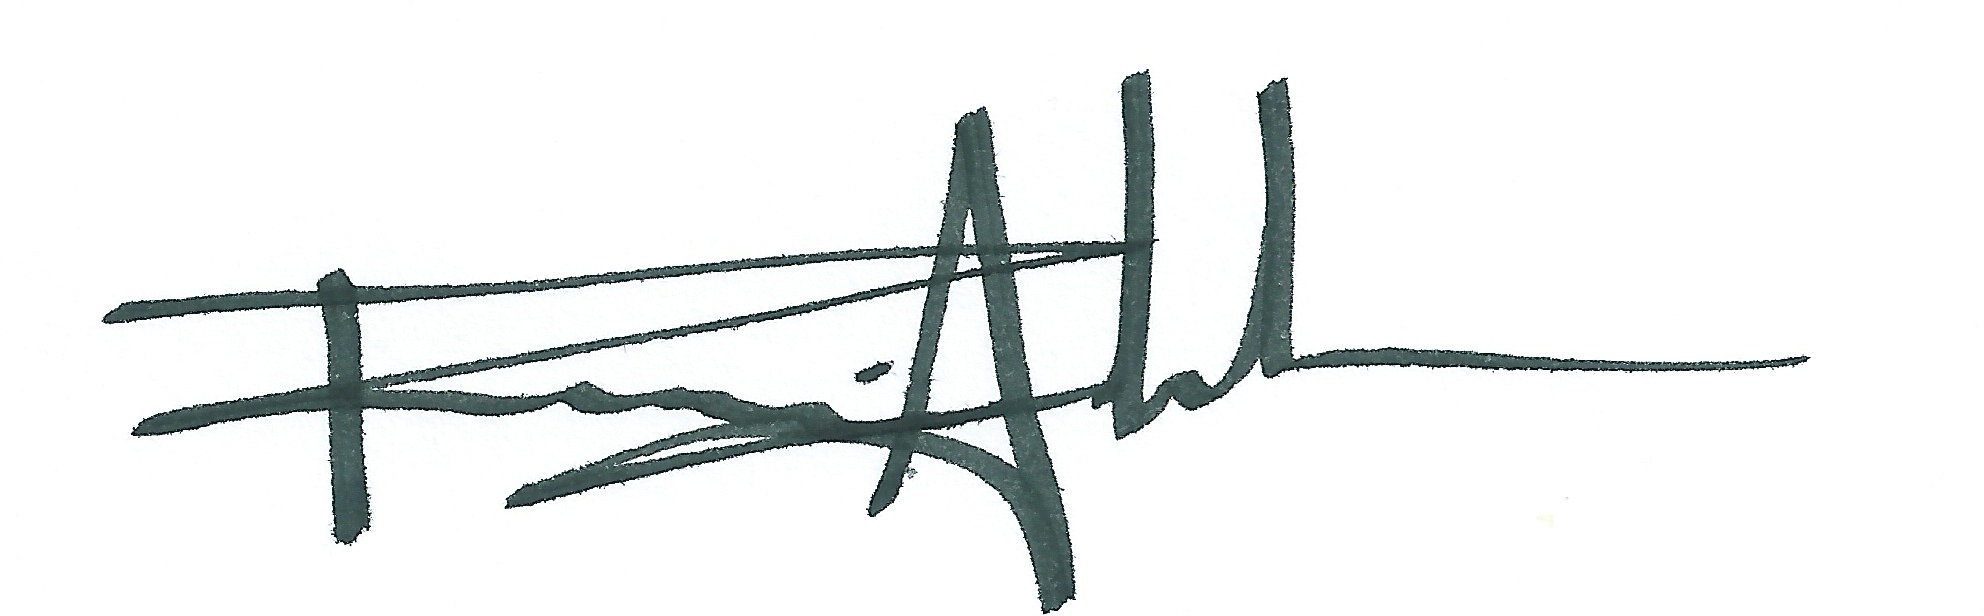 Ramiro Andrade's Signature